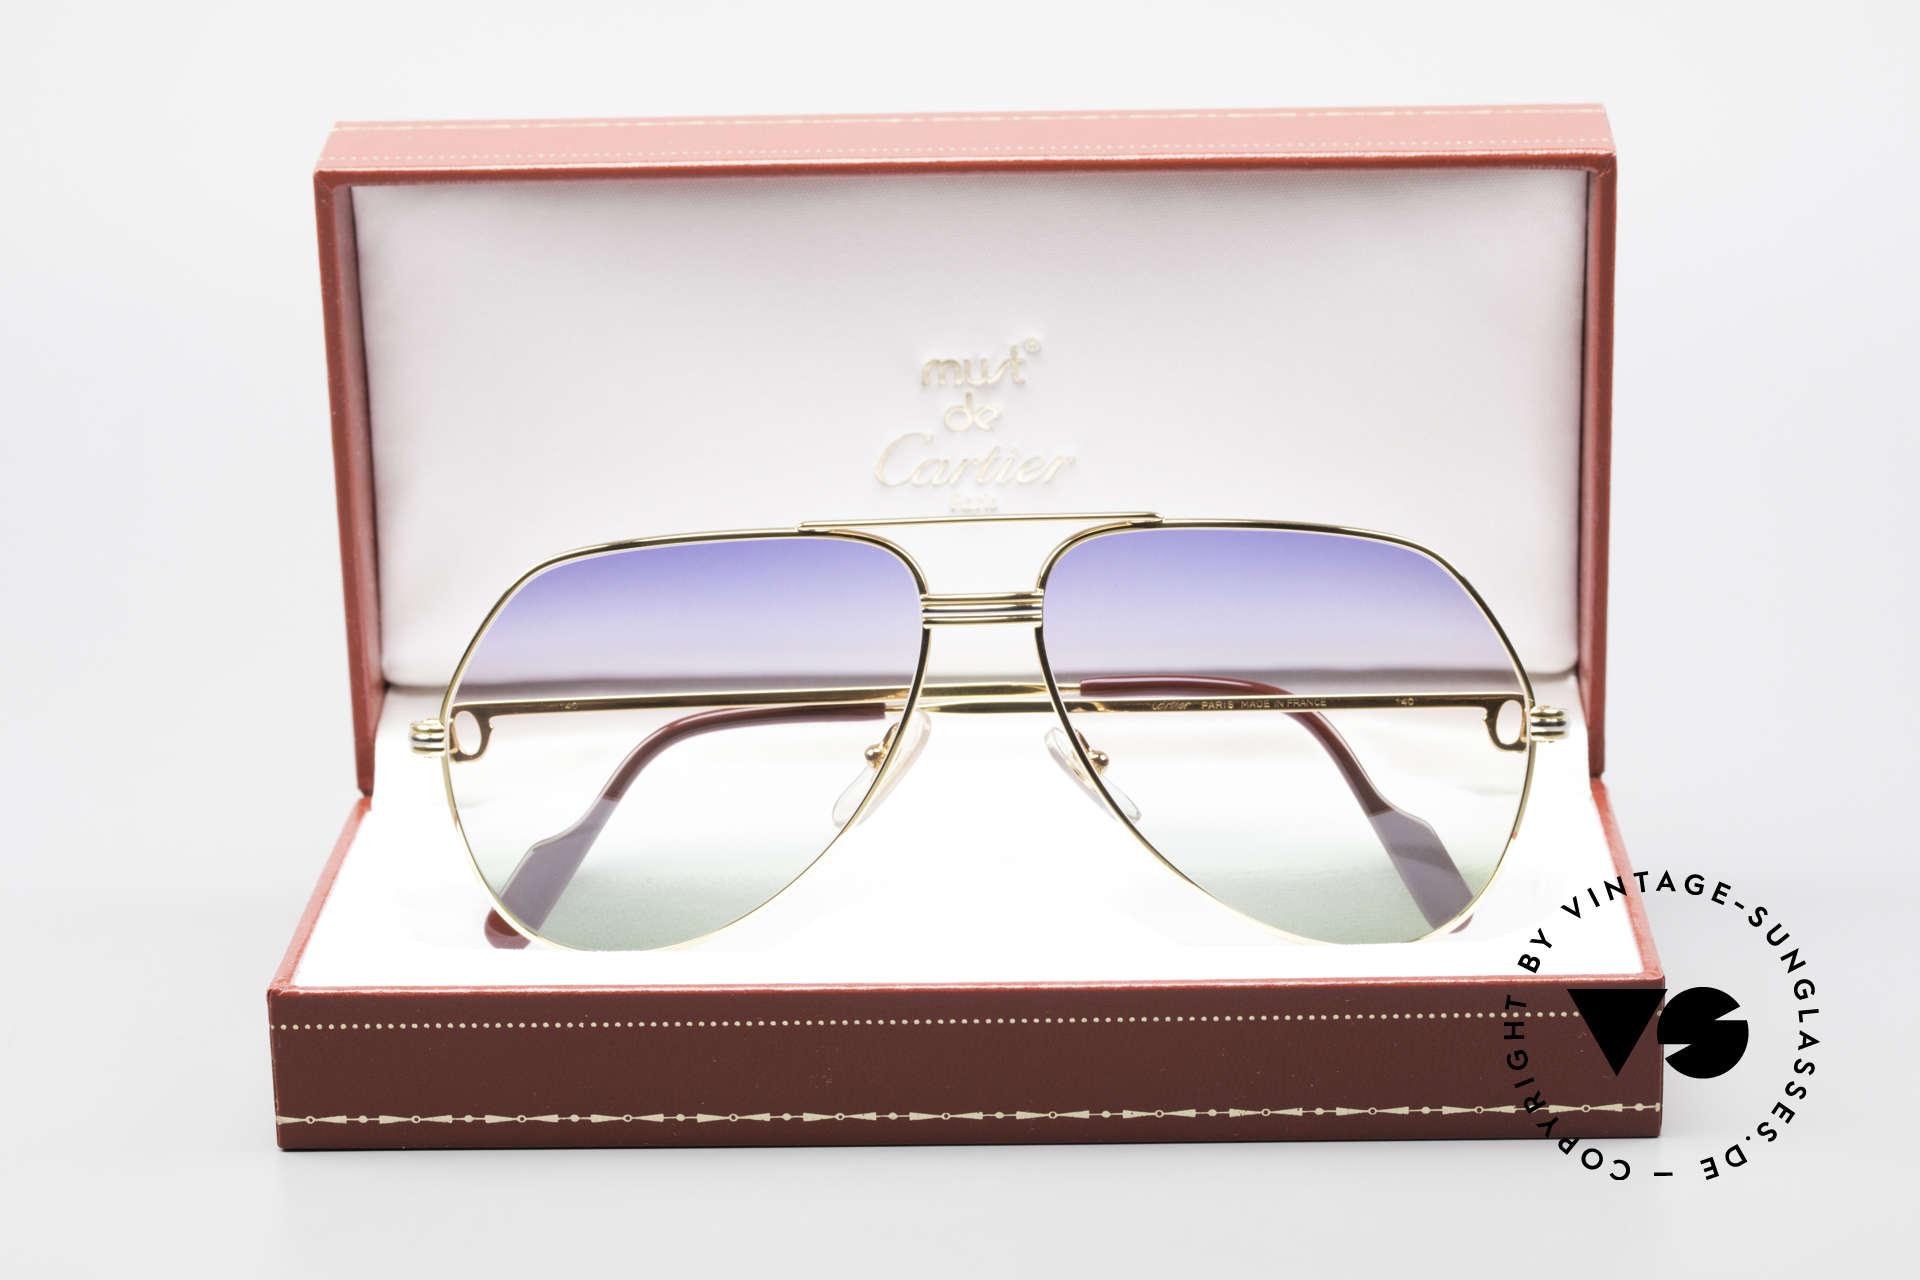 Cartier Vendome LC - L Rare Luxury Sunglasses 80's, NO retro sunglasses, but an authentic vintage ORIGINAL, Made for Men